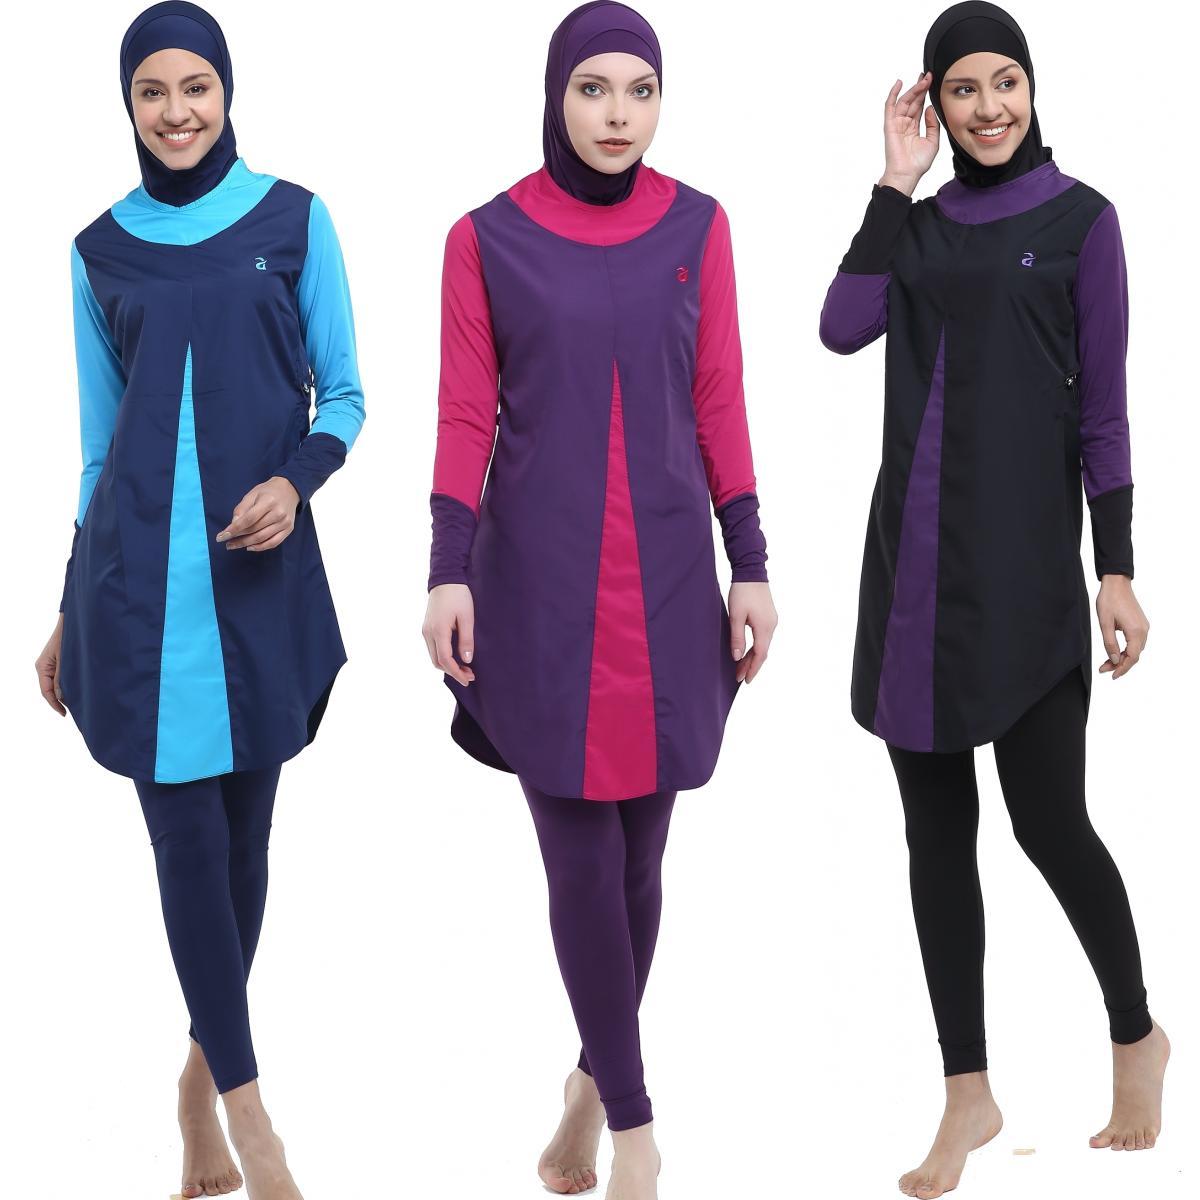 Argisa 7115 Long Sleeve Burkini Muslim Swimwear S-XXL Hidden Zipper Hijab Hijab Islamic Swimsuit Burkinis Full Cover Swim Surf